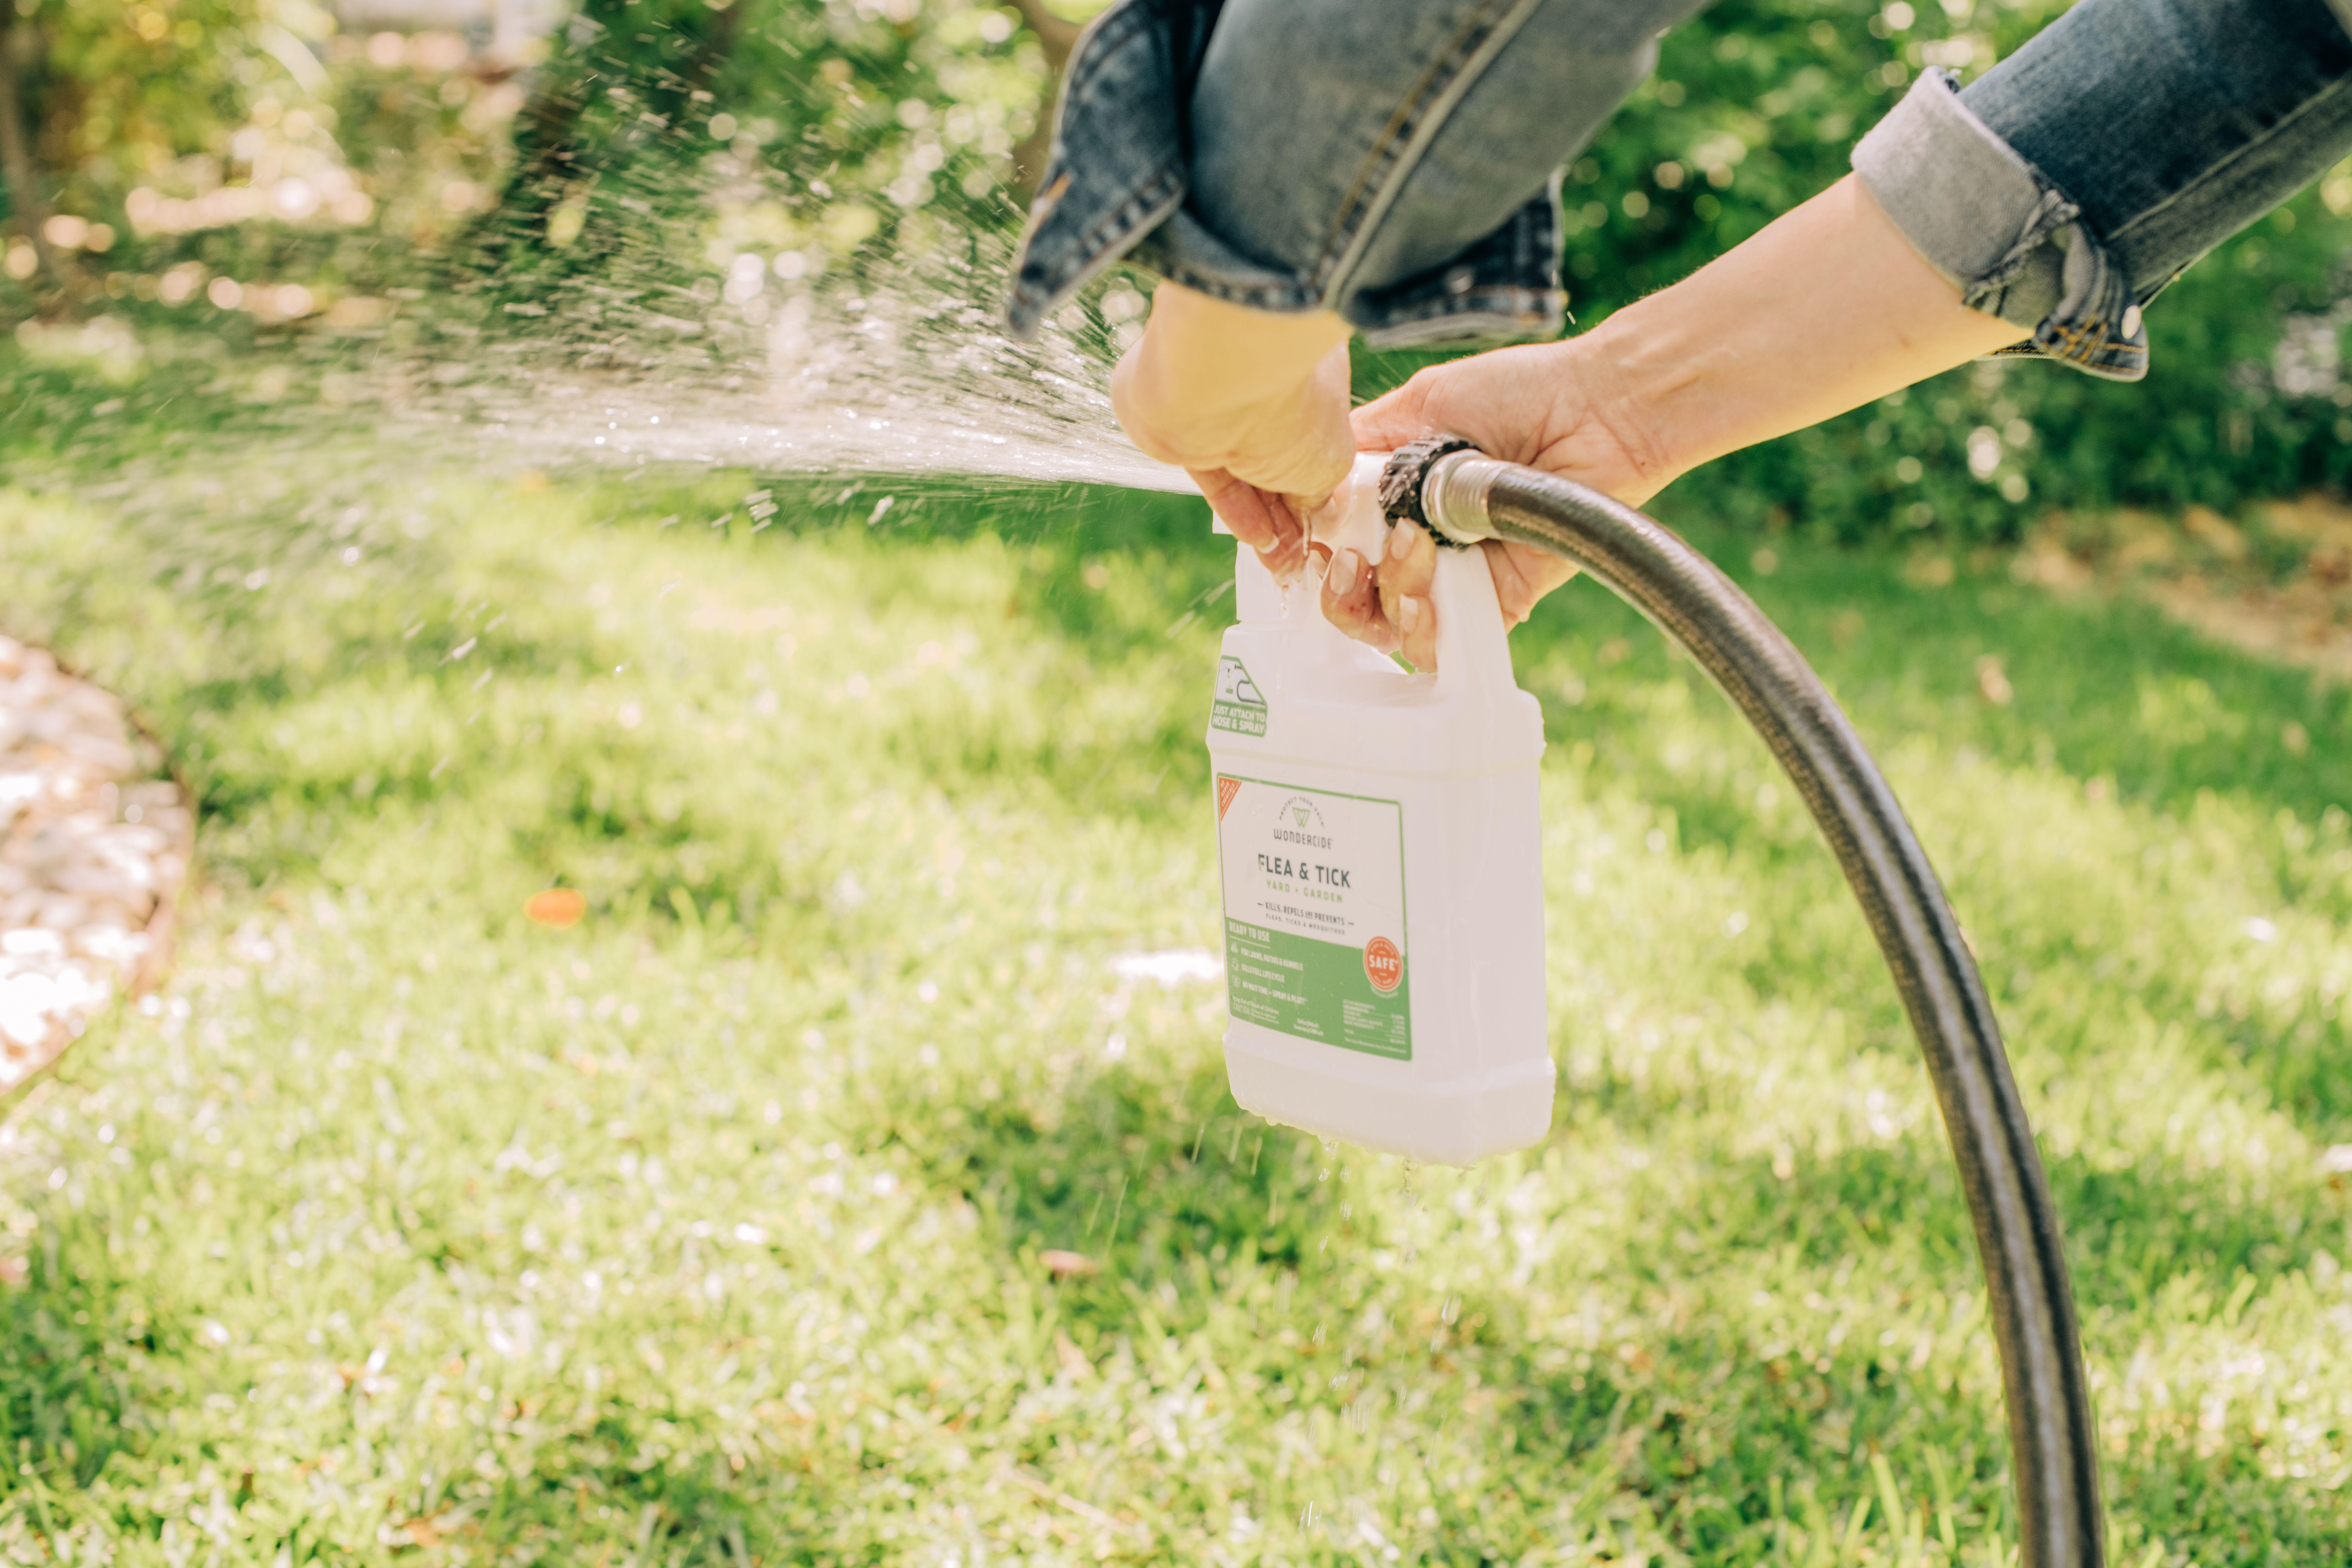 Ready To Use Flea Tick Spray For Yard Garden In 2020 Tick Spray For Yard Flea And Tick Spray Flea Treatment For Yard